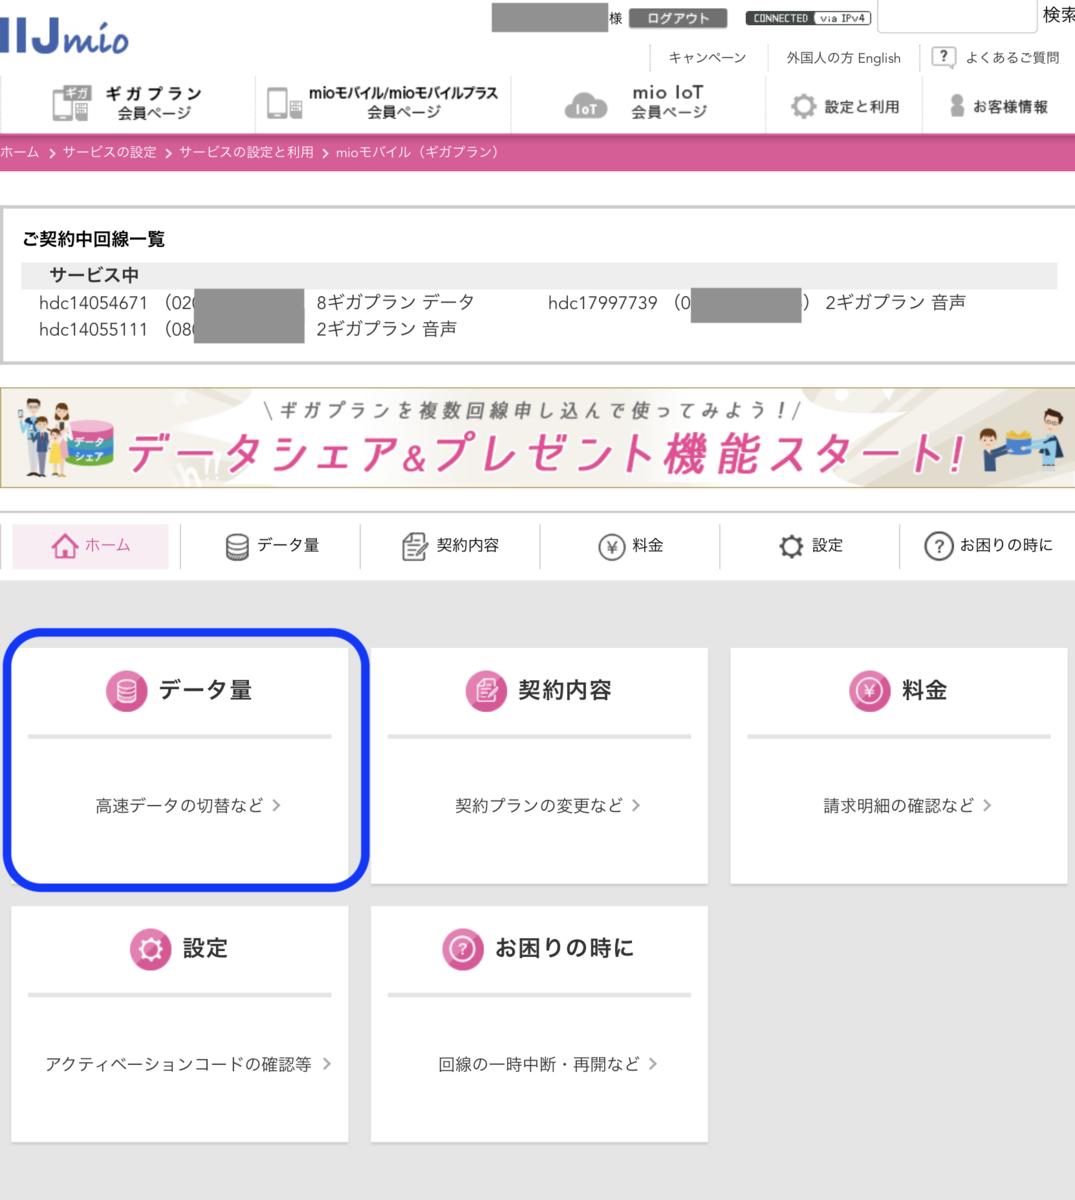 f:id:KuriKumaChan:20210601140401p:plain